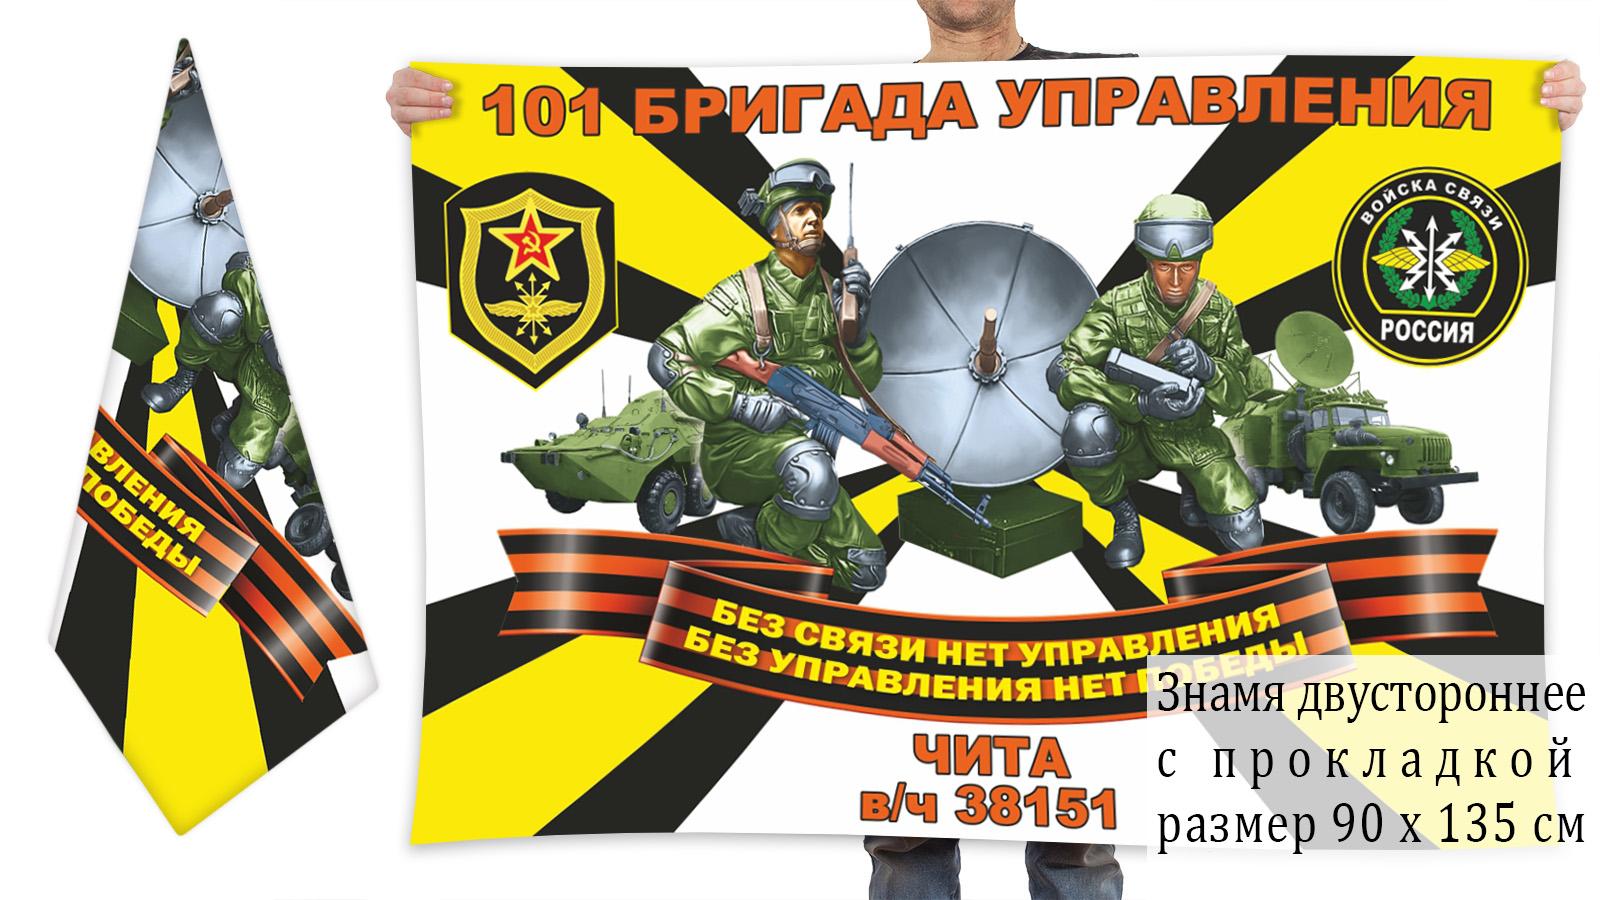 Двусторонний флаг 101 бригада управления войск связи